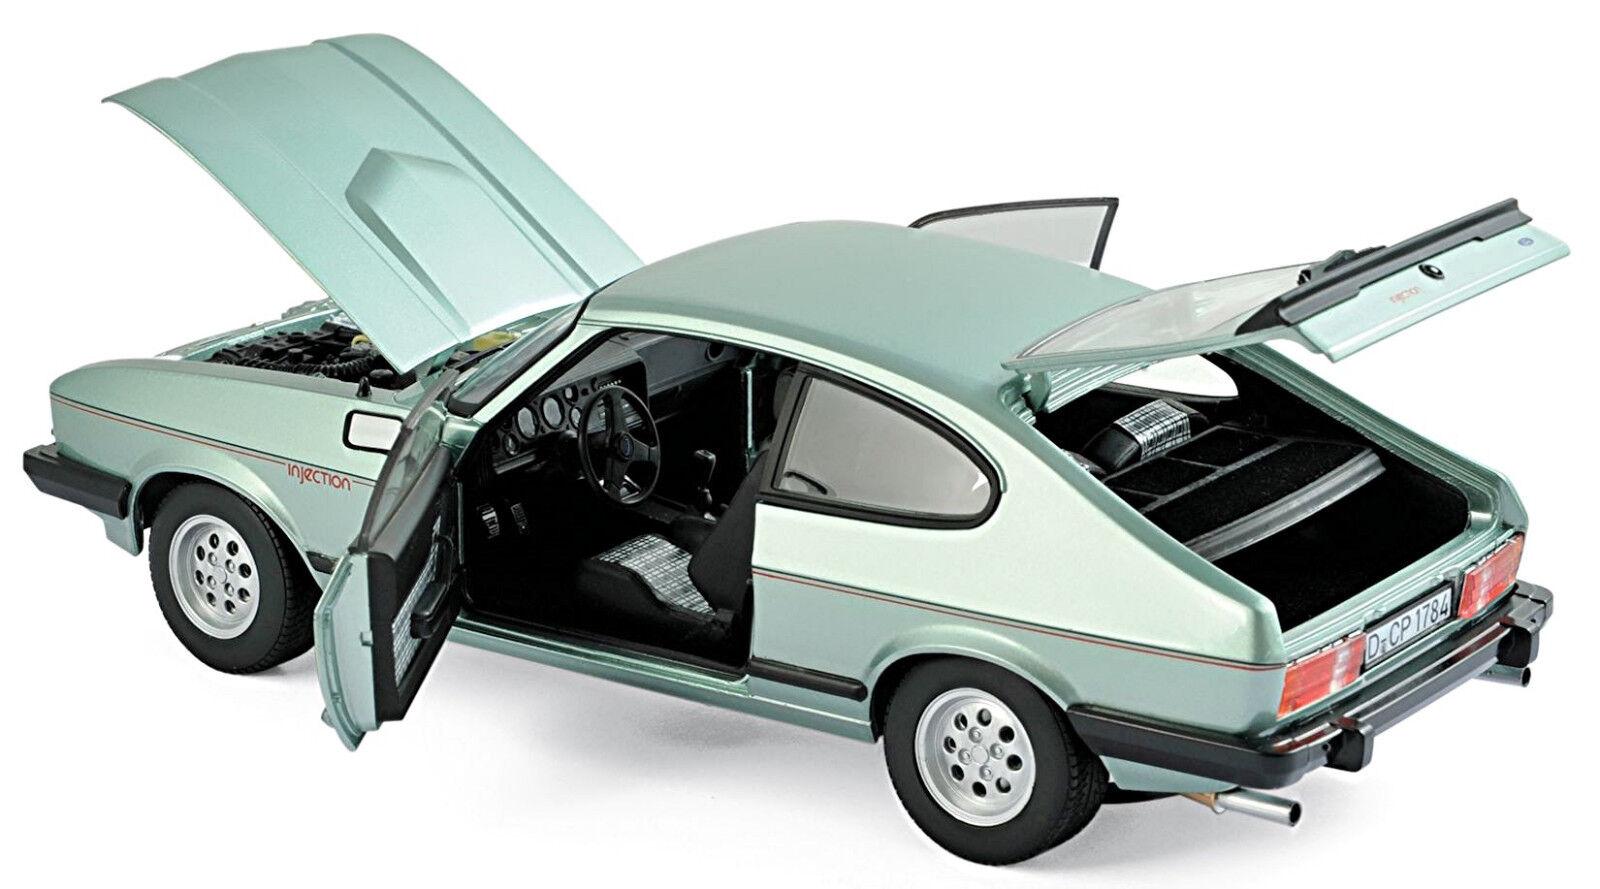 Ford Capri Mk. III III III 2,8 Injection 1982 Crystal Grün Metallic 1 18 Norev  | Elegante Und Stabile Verpackung  968cc8